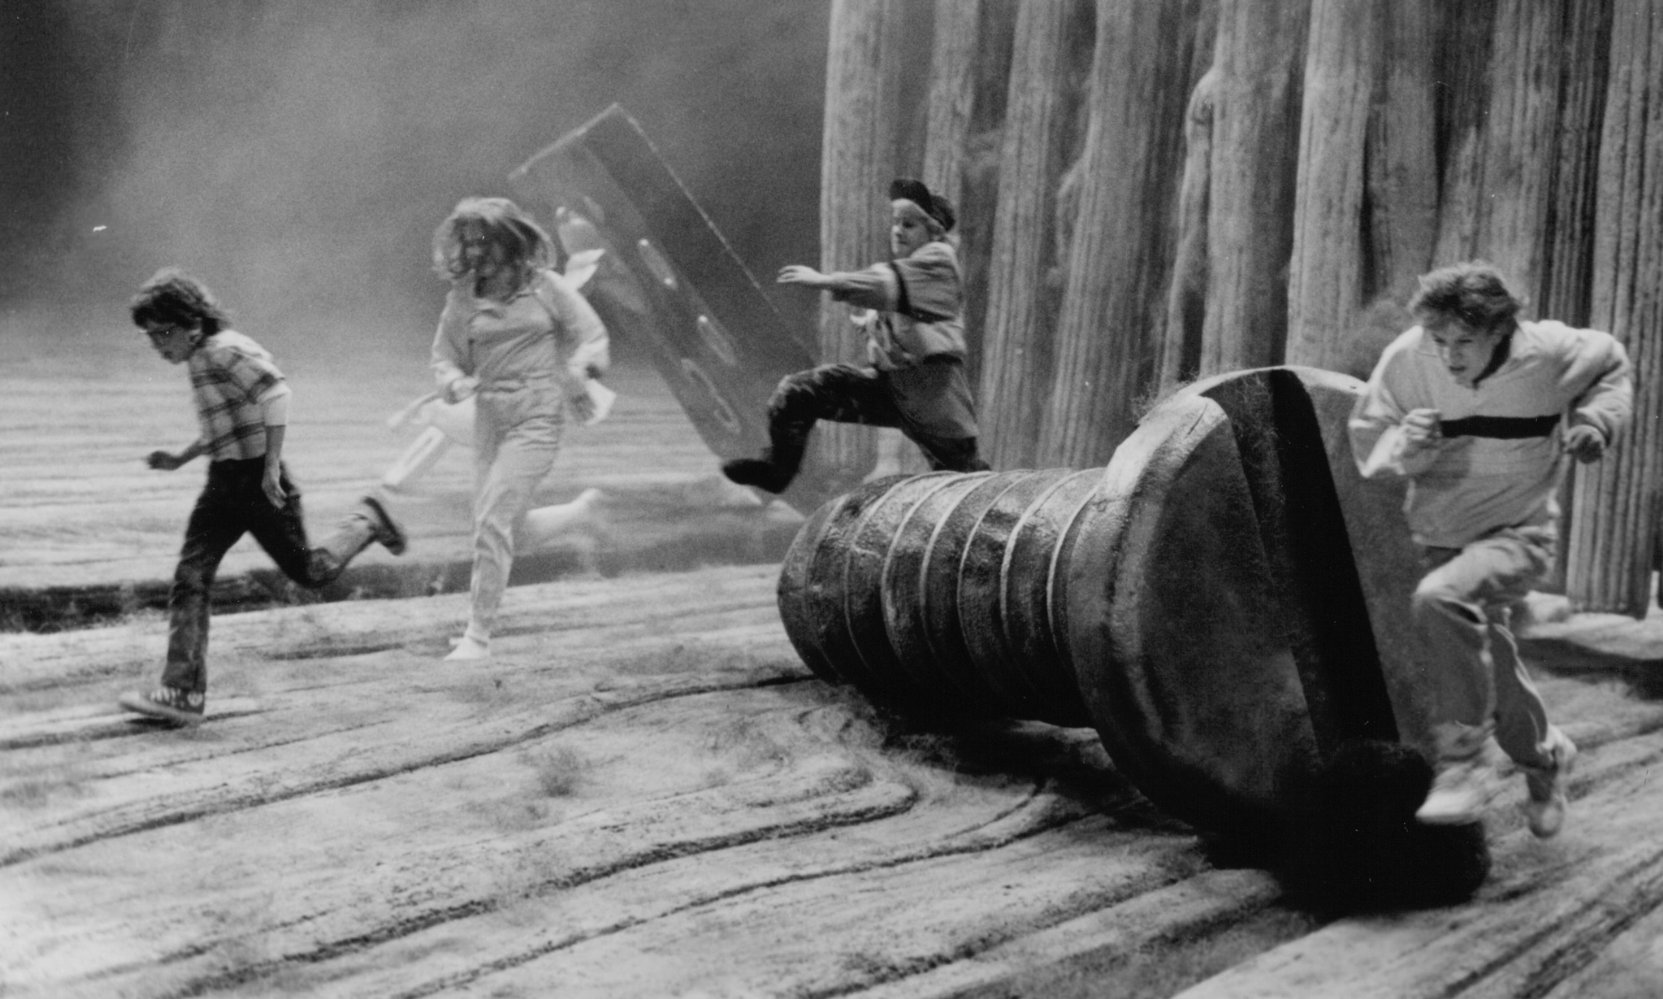 All About Celebrity Thomas Wilson Brown Birthday 27 December 1972 Lusk Wyoming Usa Fusion Movies Rick moranis matt frewer thomas wilson brown jared rushton kristine sutherland amy o'neill marcia strassman. all about celebrity thomas wilson brown